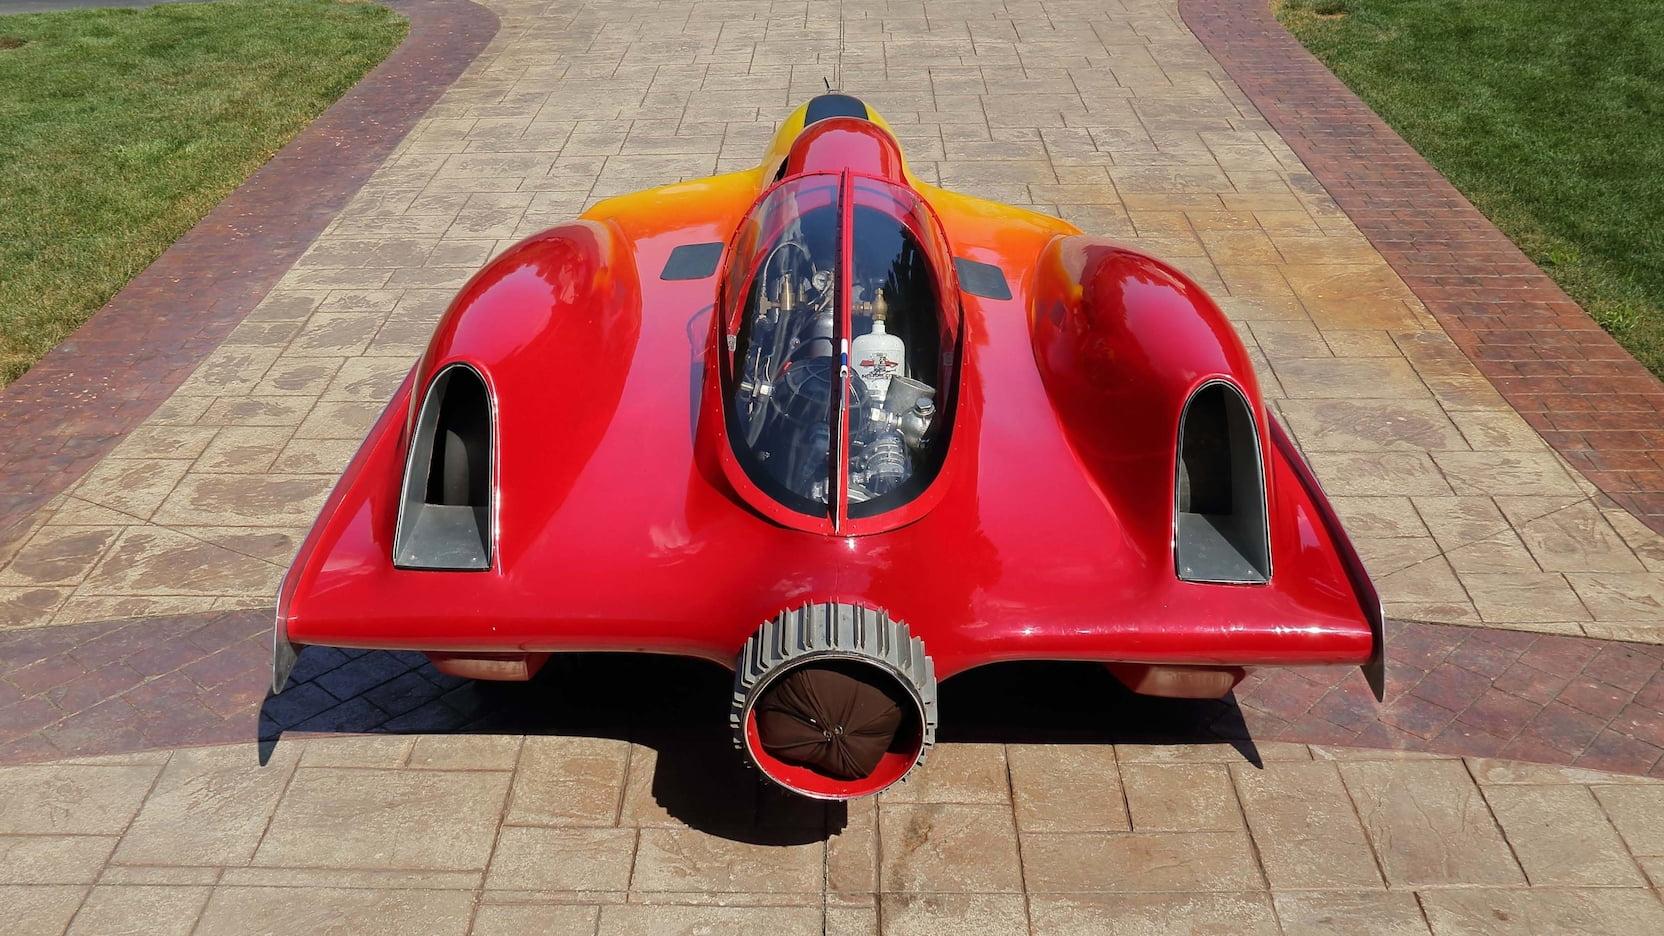 1964 Barris Kustoms Turbosonic Custom Dragster